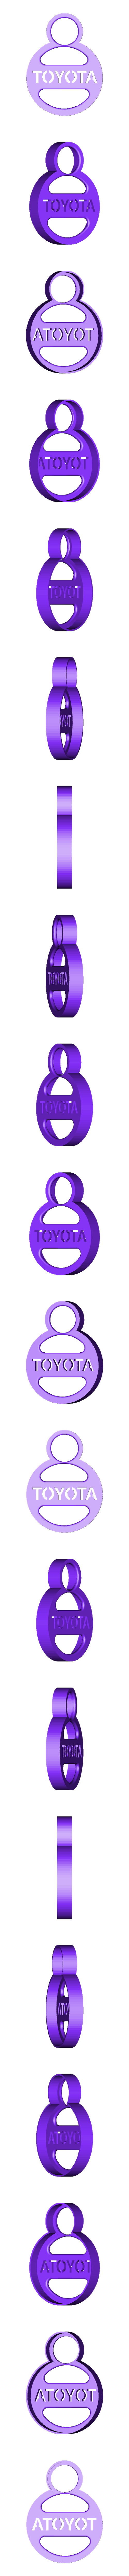 Toyota_Key_Chain_Base.stl Download free STL file TOYOTA GEAR KEY CHAIN • 3D printer template, GREGCAR_3DPrinting